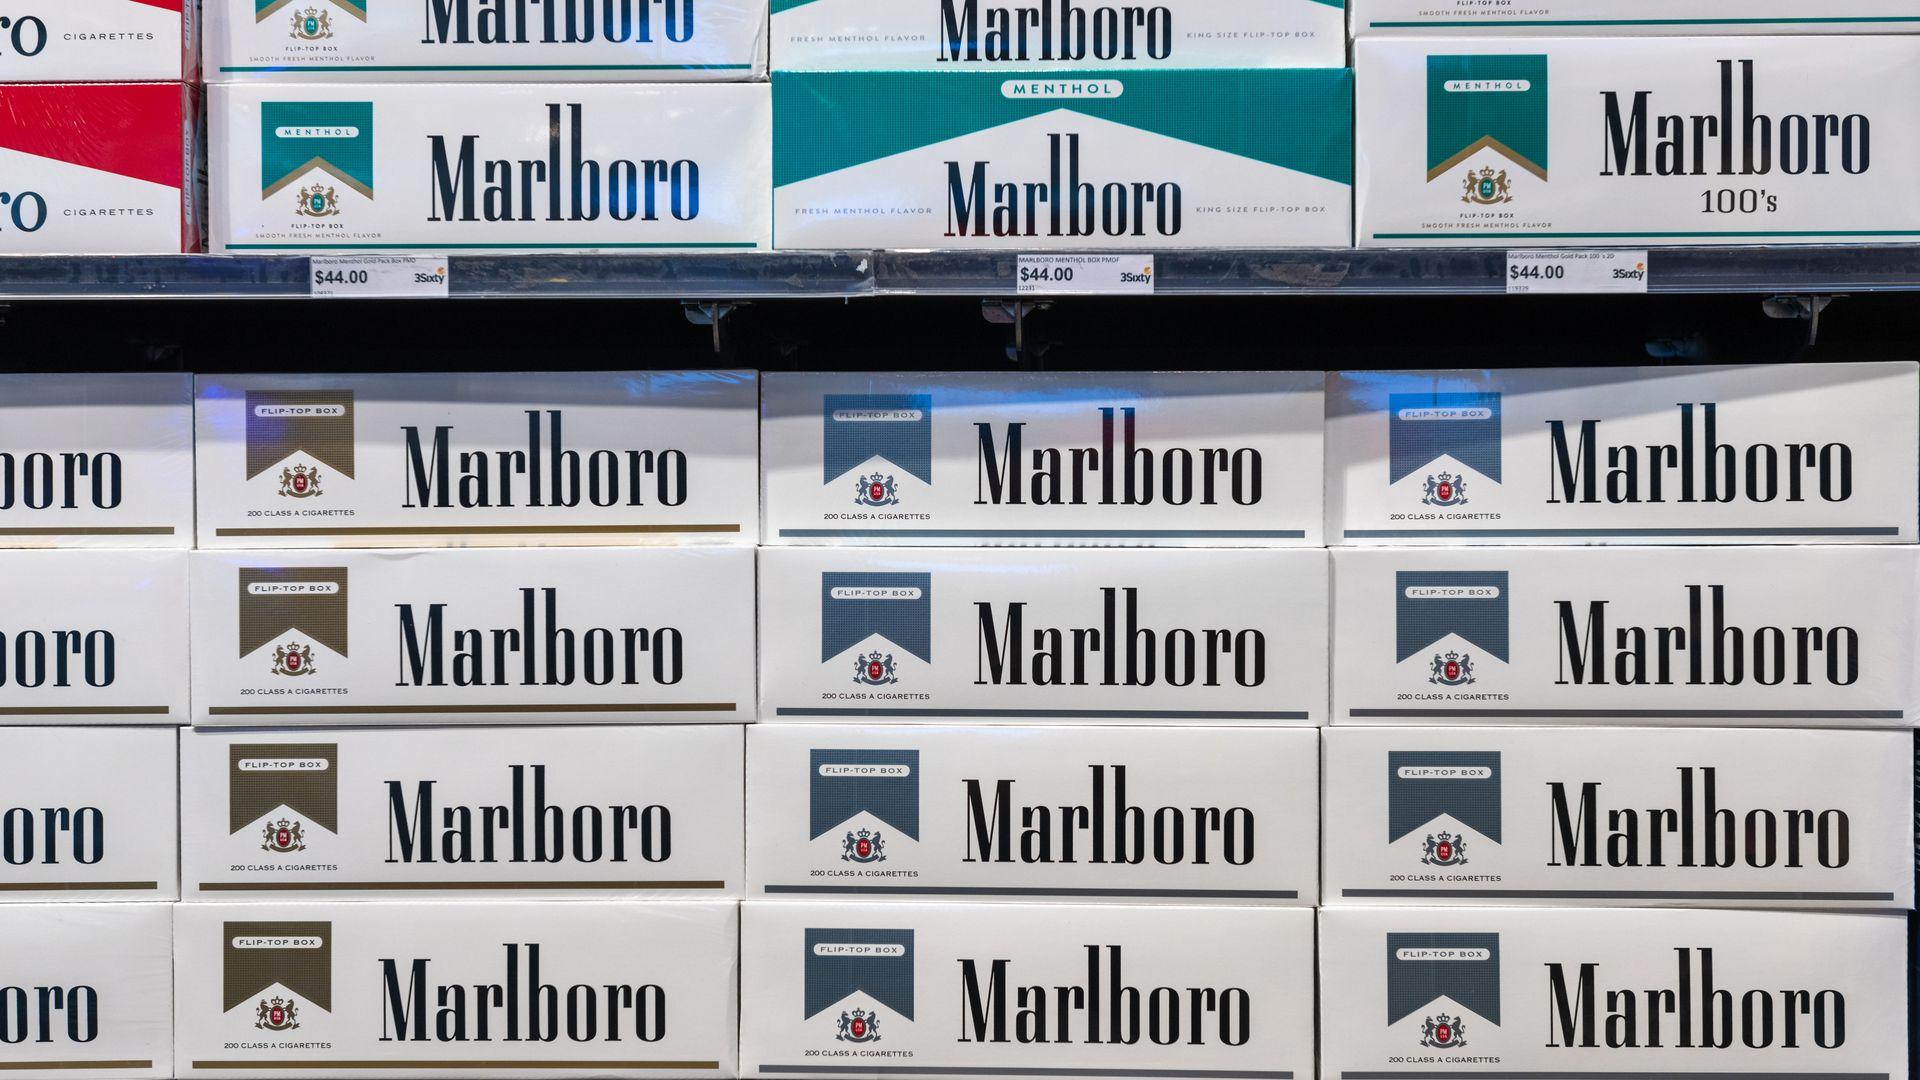 stacks of marlboro cartons